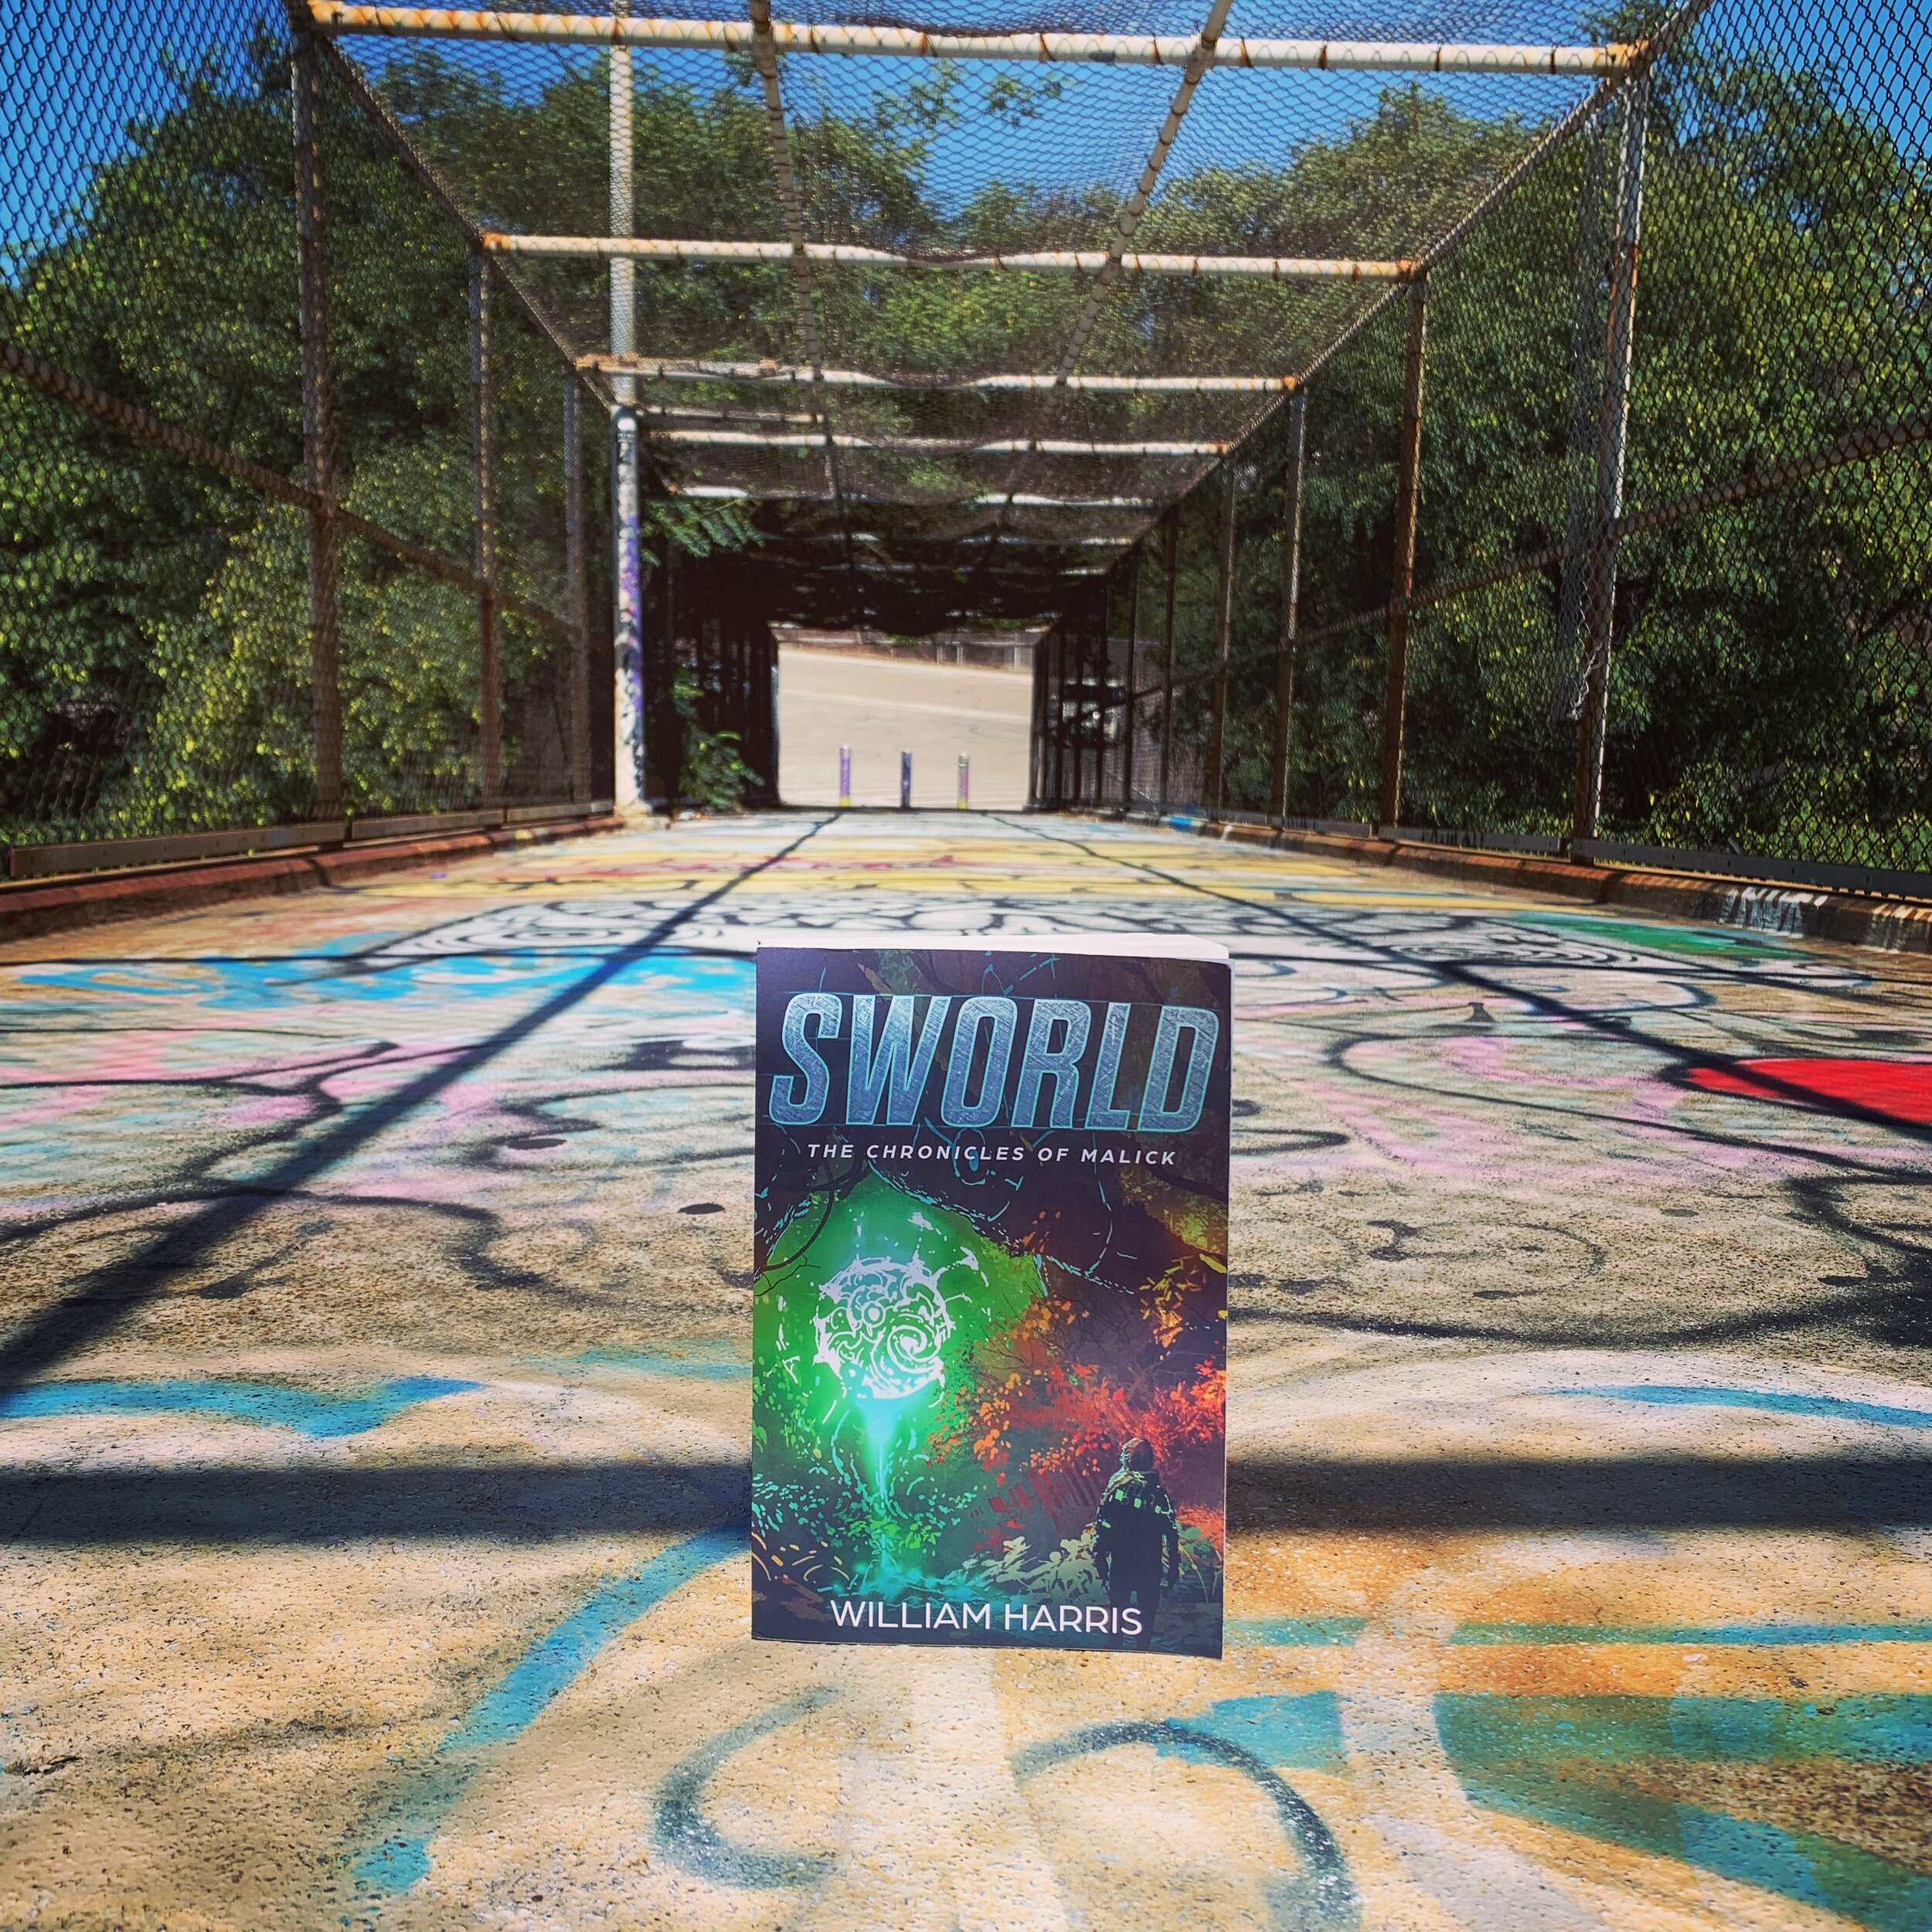 Sworld on a footbridge.